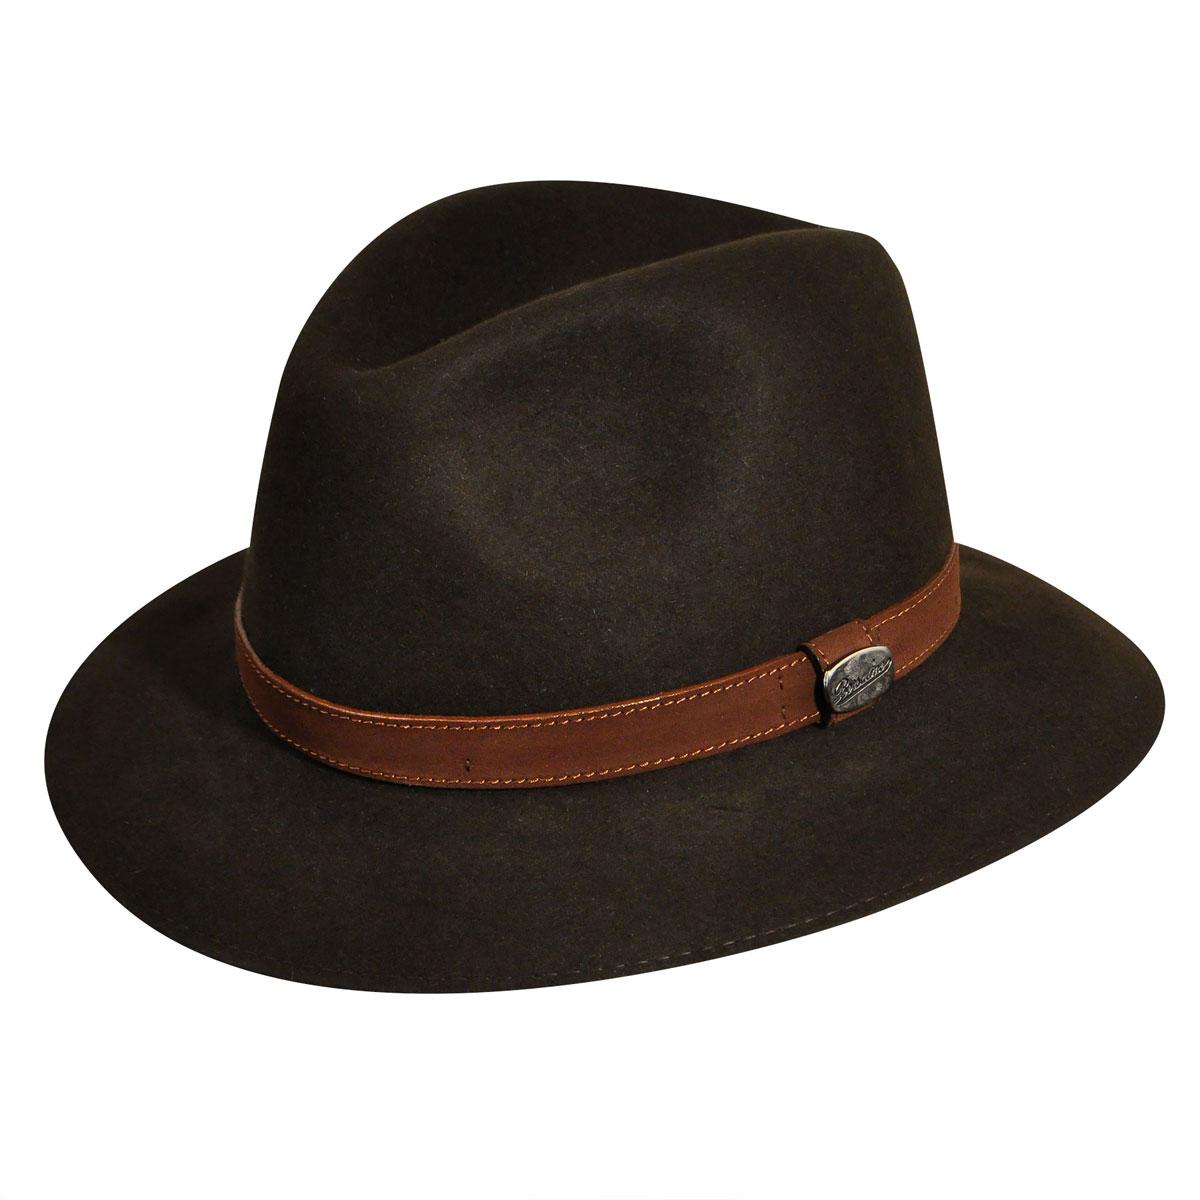 565a7c03751 Borsalino Traveler Fur Felt Fedora 7 1 2 Brown